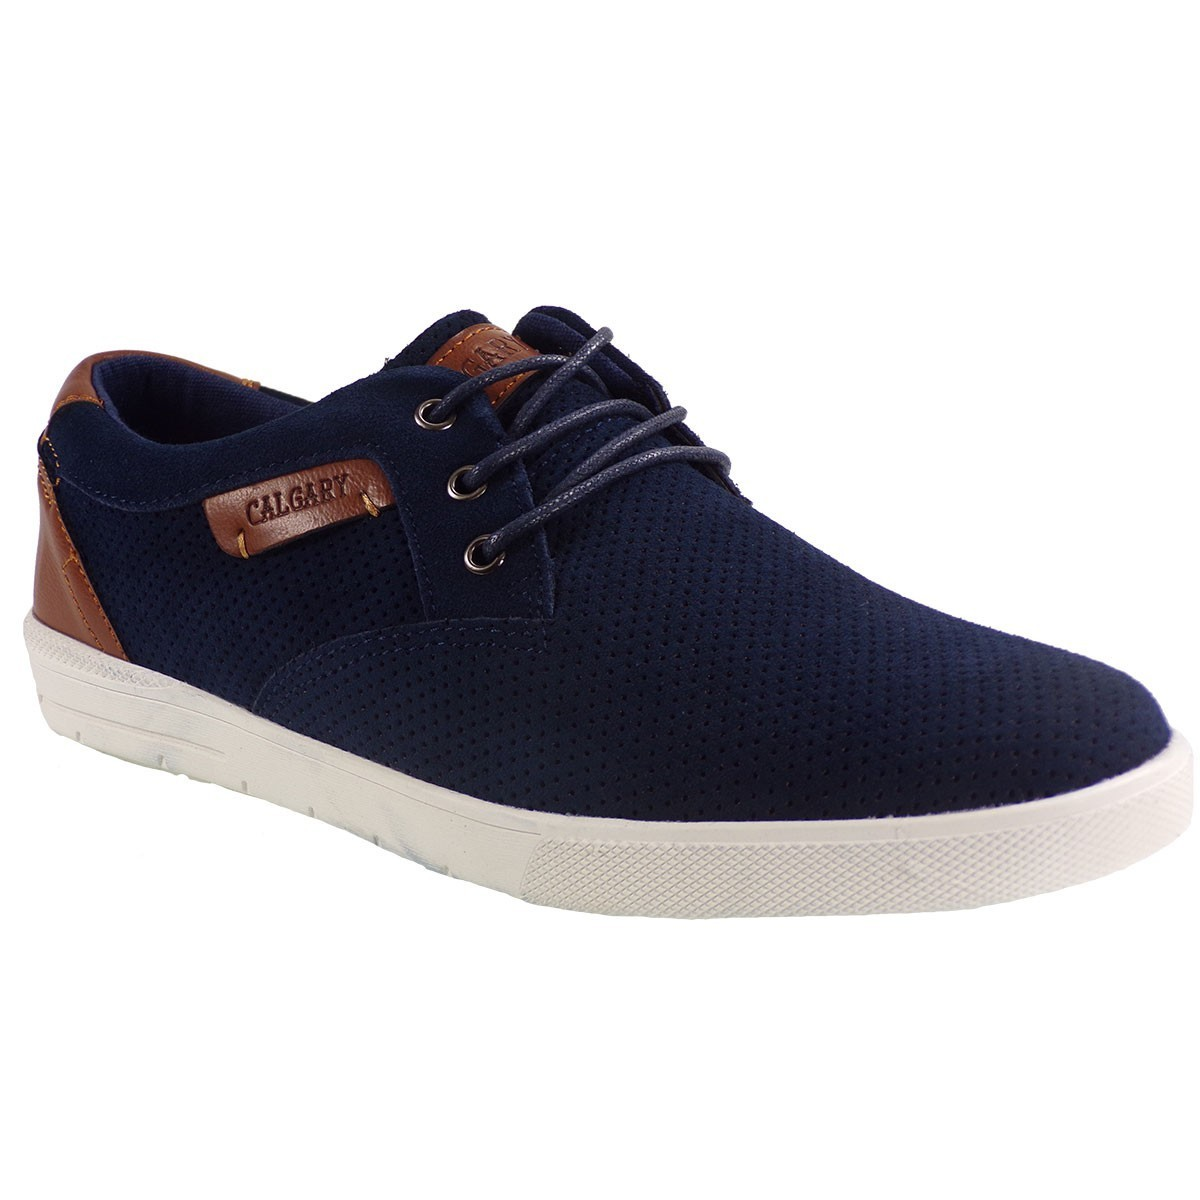 calgary andika papoytsia sneakers 18602 mple tampa www.bagiotashoes.gr